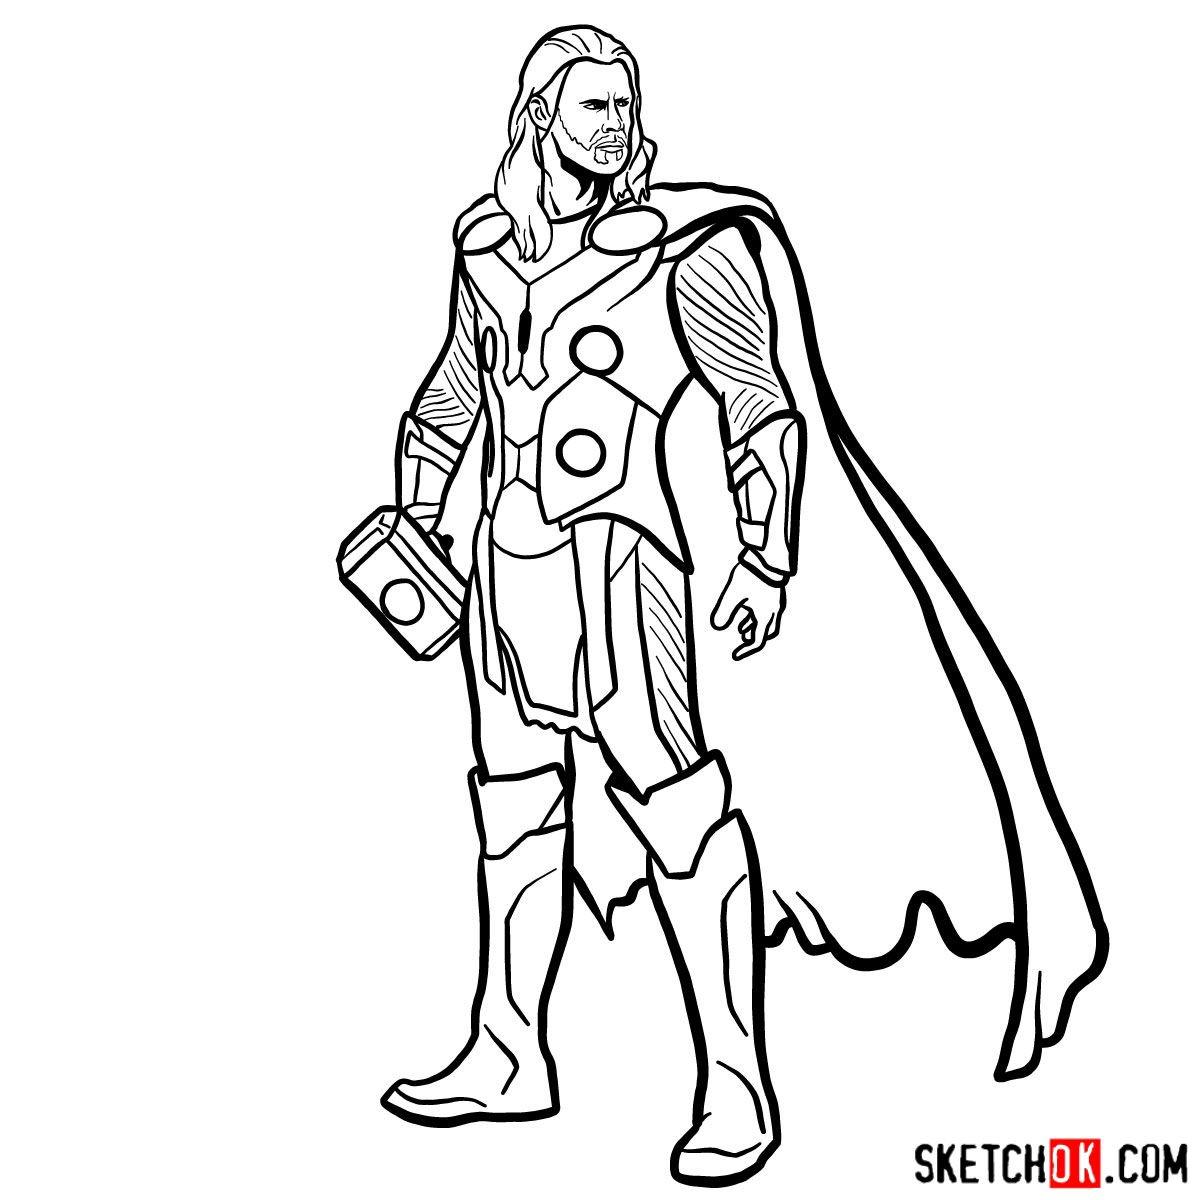 How to draw Thor Odinson (Chris Hemsworth) - step 18